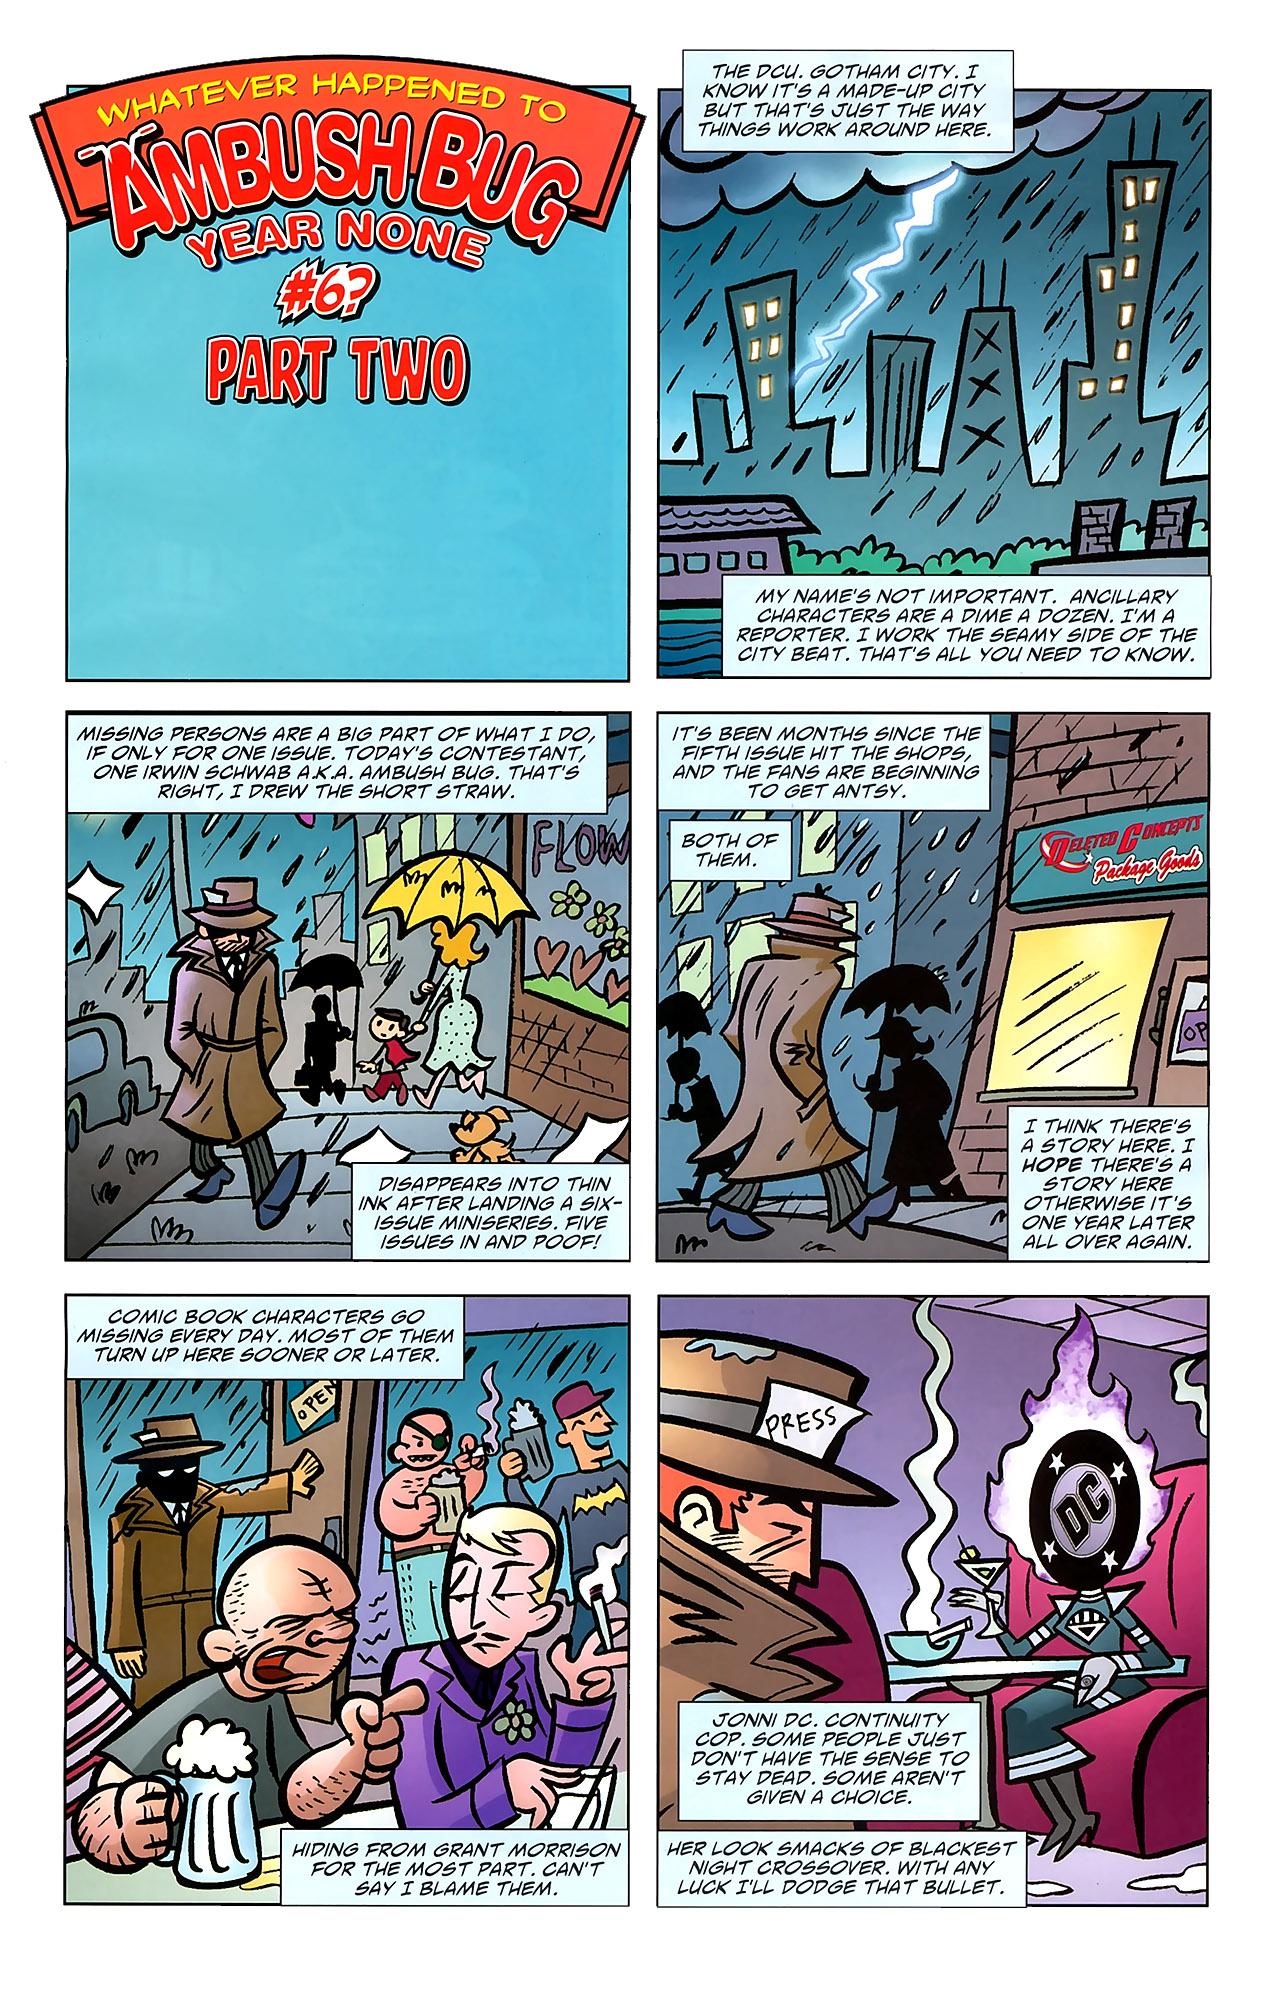 Read online Ambush Bug: Year None comic -  Issue #7 - 4